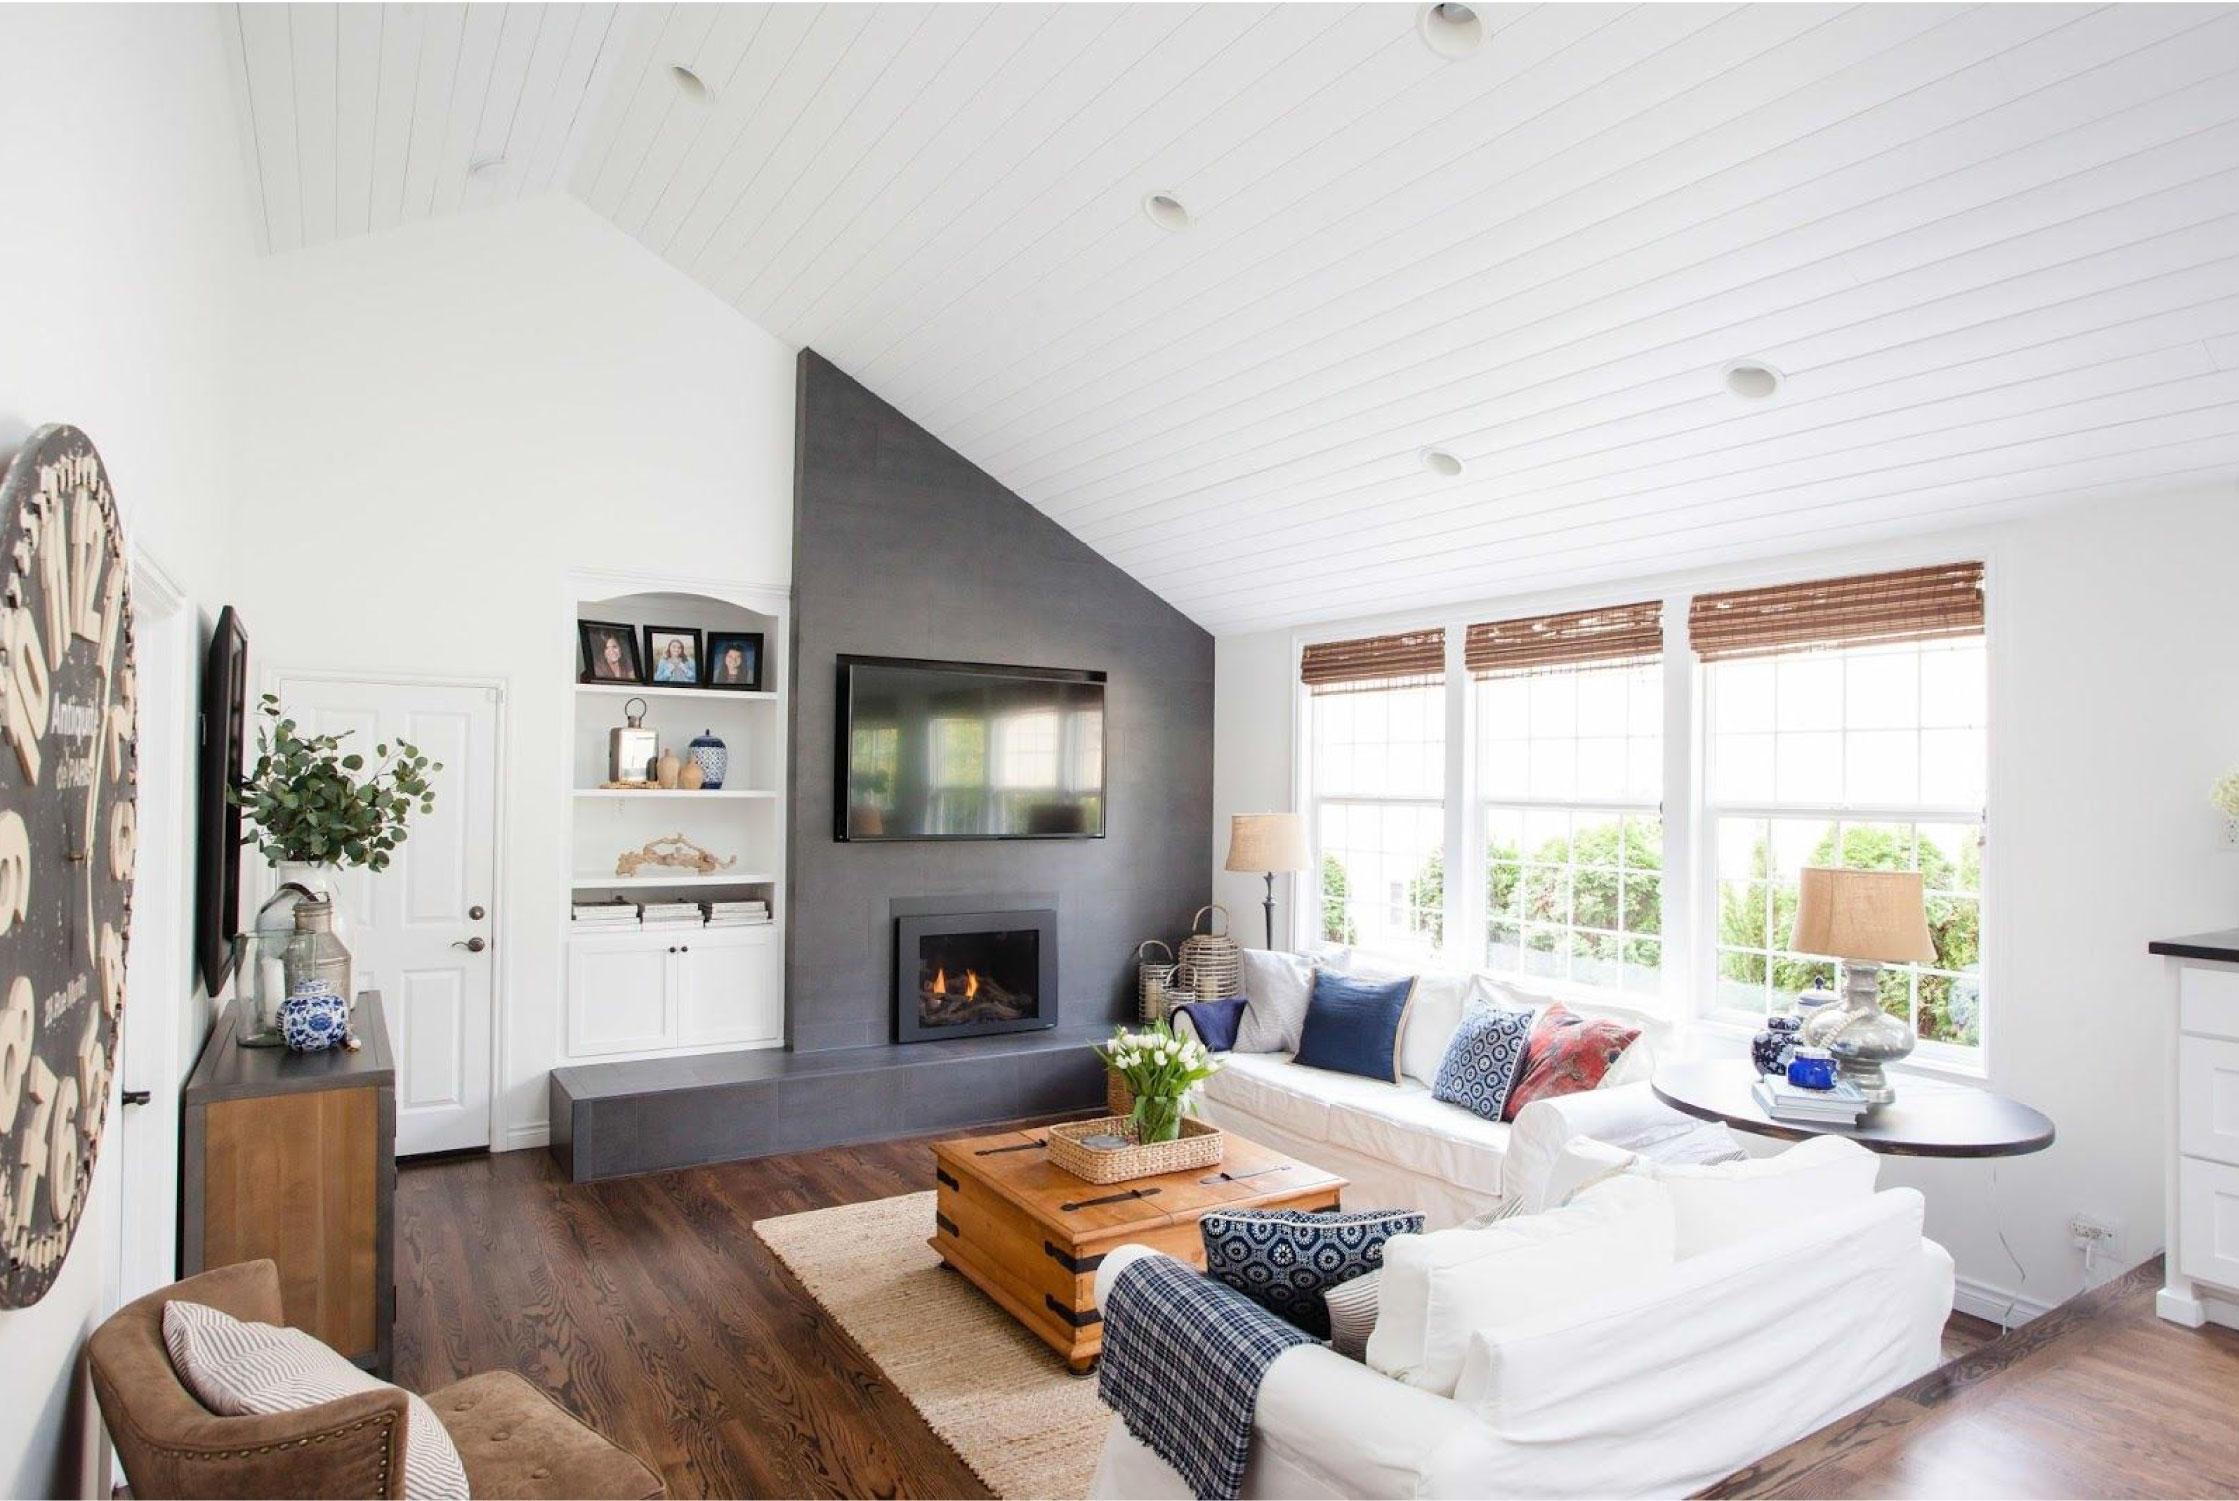 steward_of_design_living_room_2239x1501.jpg